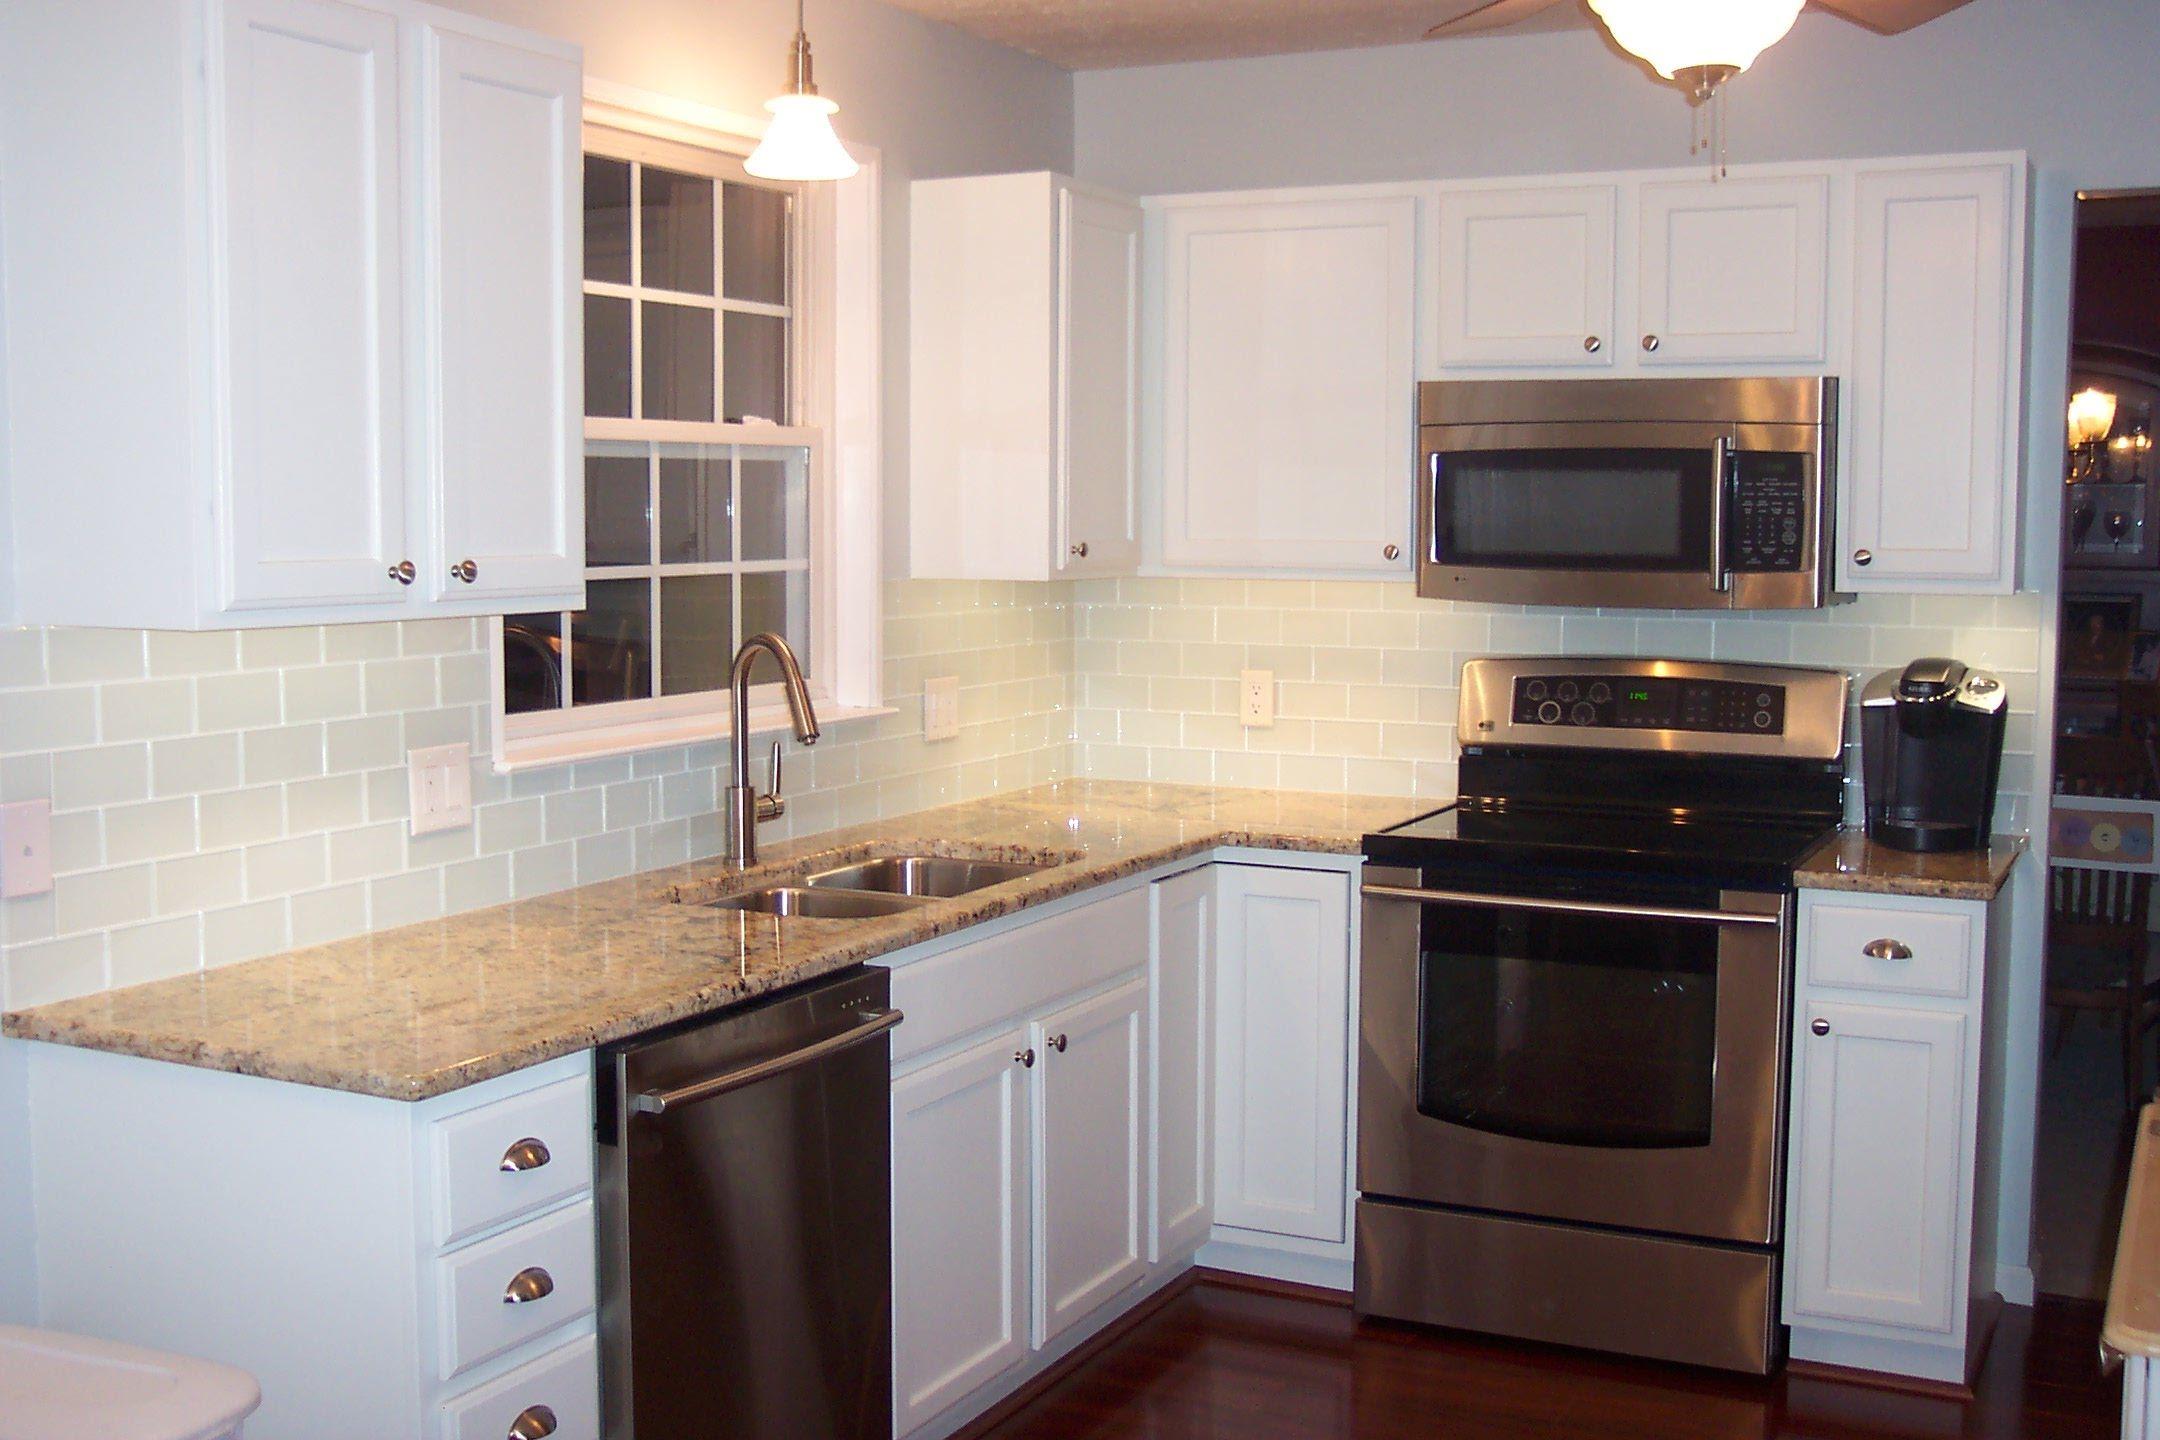 White Ceramic Subway Tile Backsplash Feat Brown Granite Countertop Kitchen Design Small Kitchen Layout Kitchen Cabinet Design